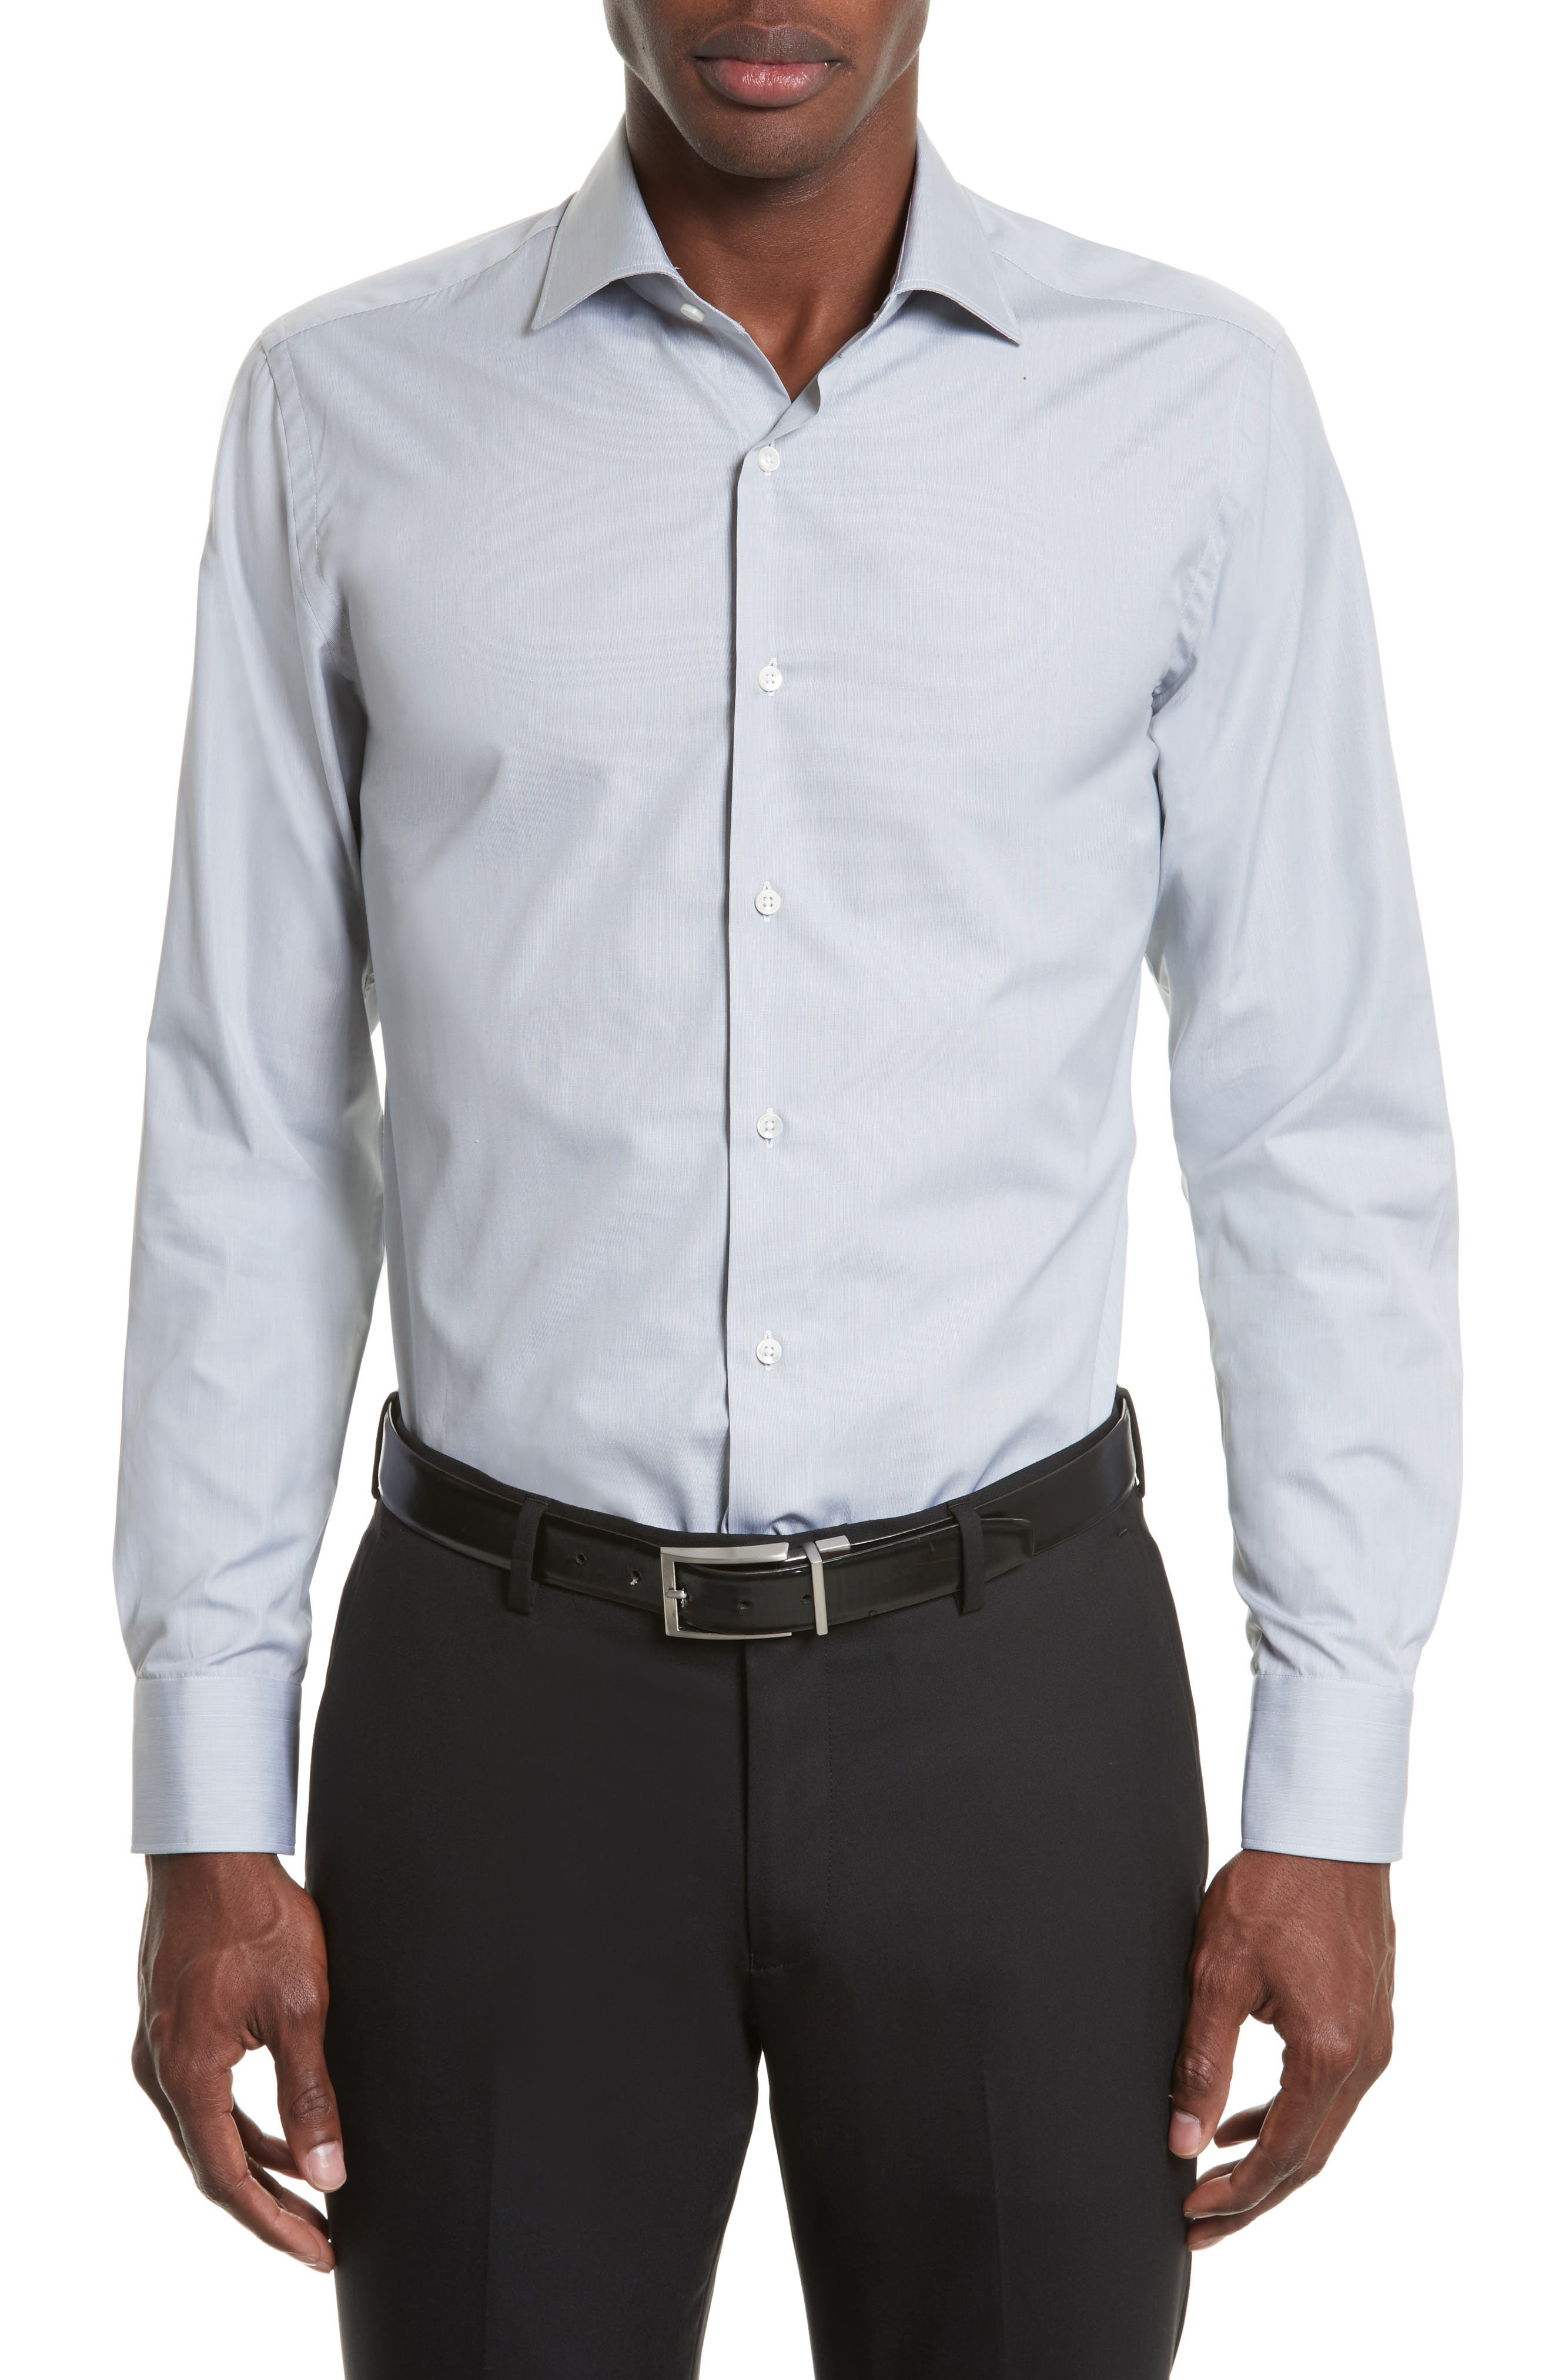 Regular Fit Solid Dress Shirt,                             Main thumbnail 1, color,                             050